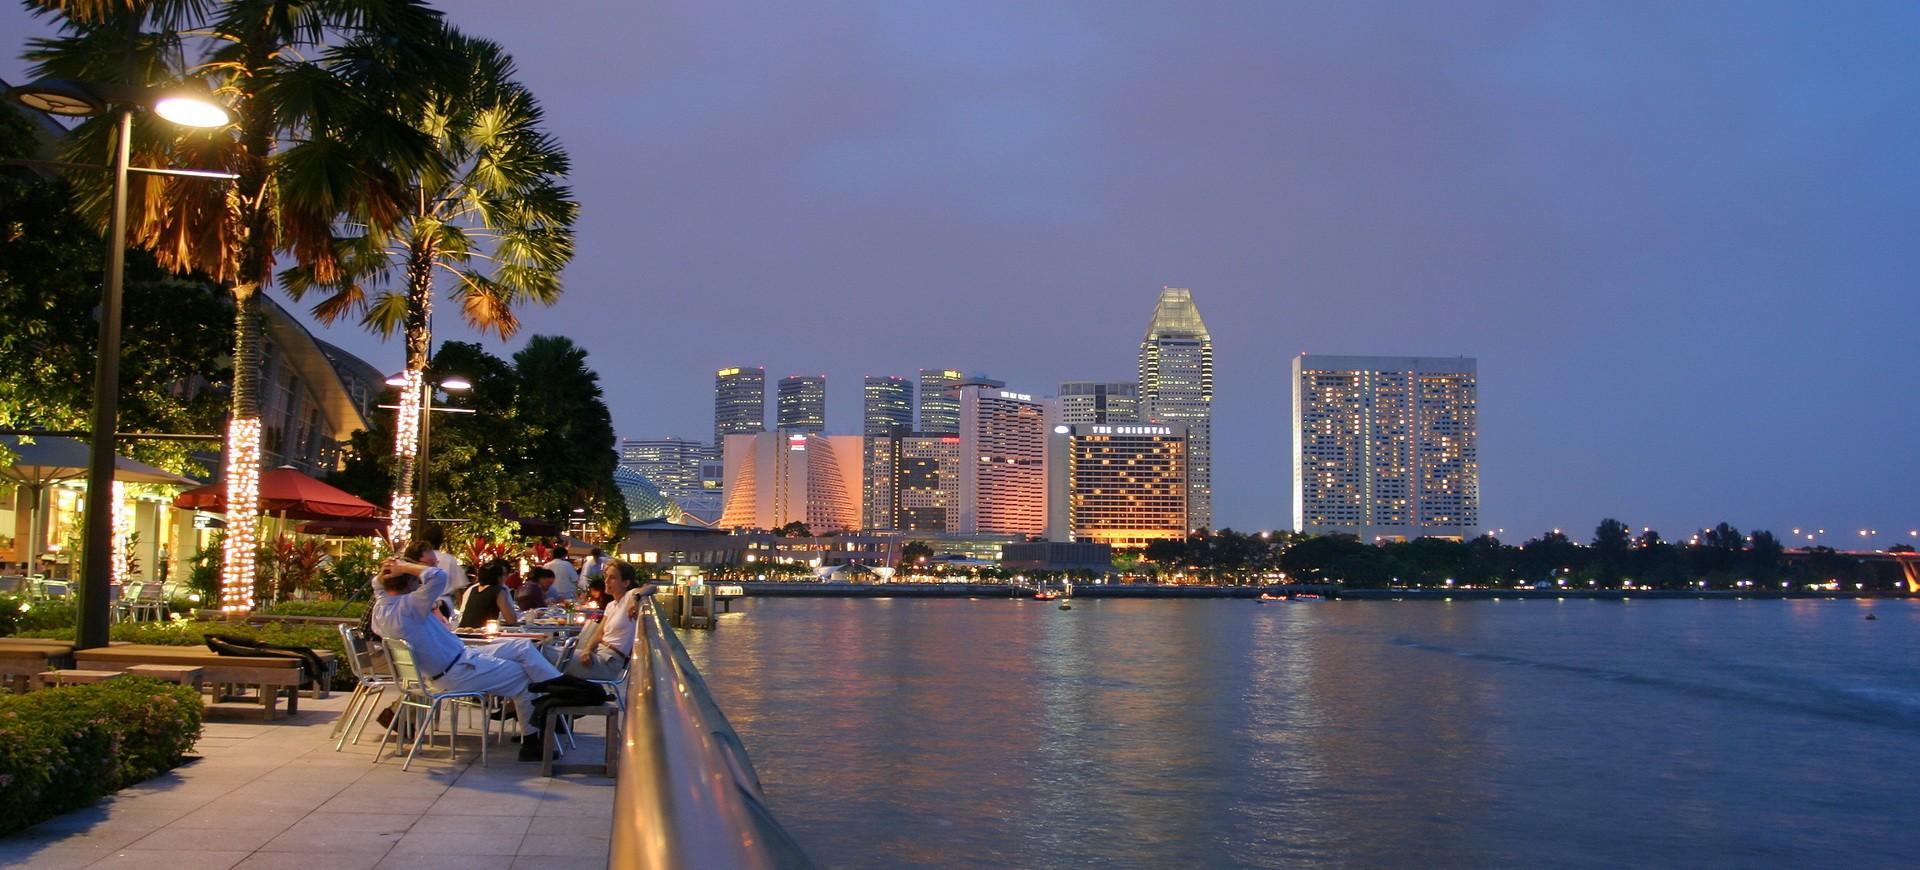 Baie de Singapour by night